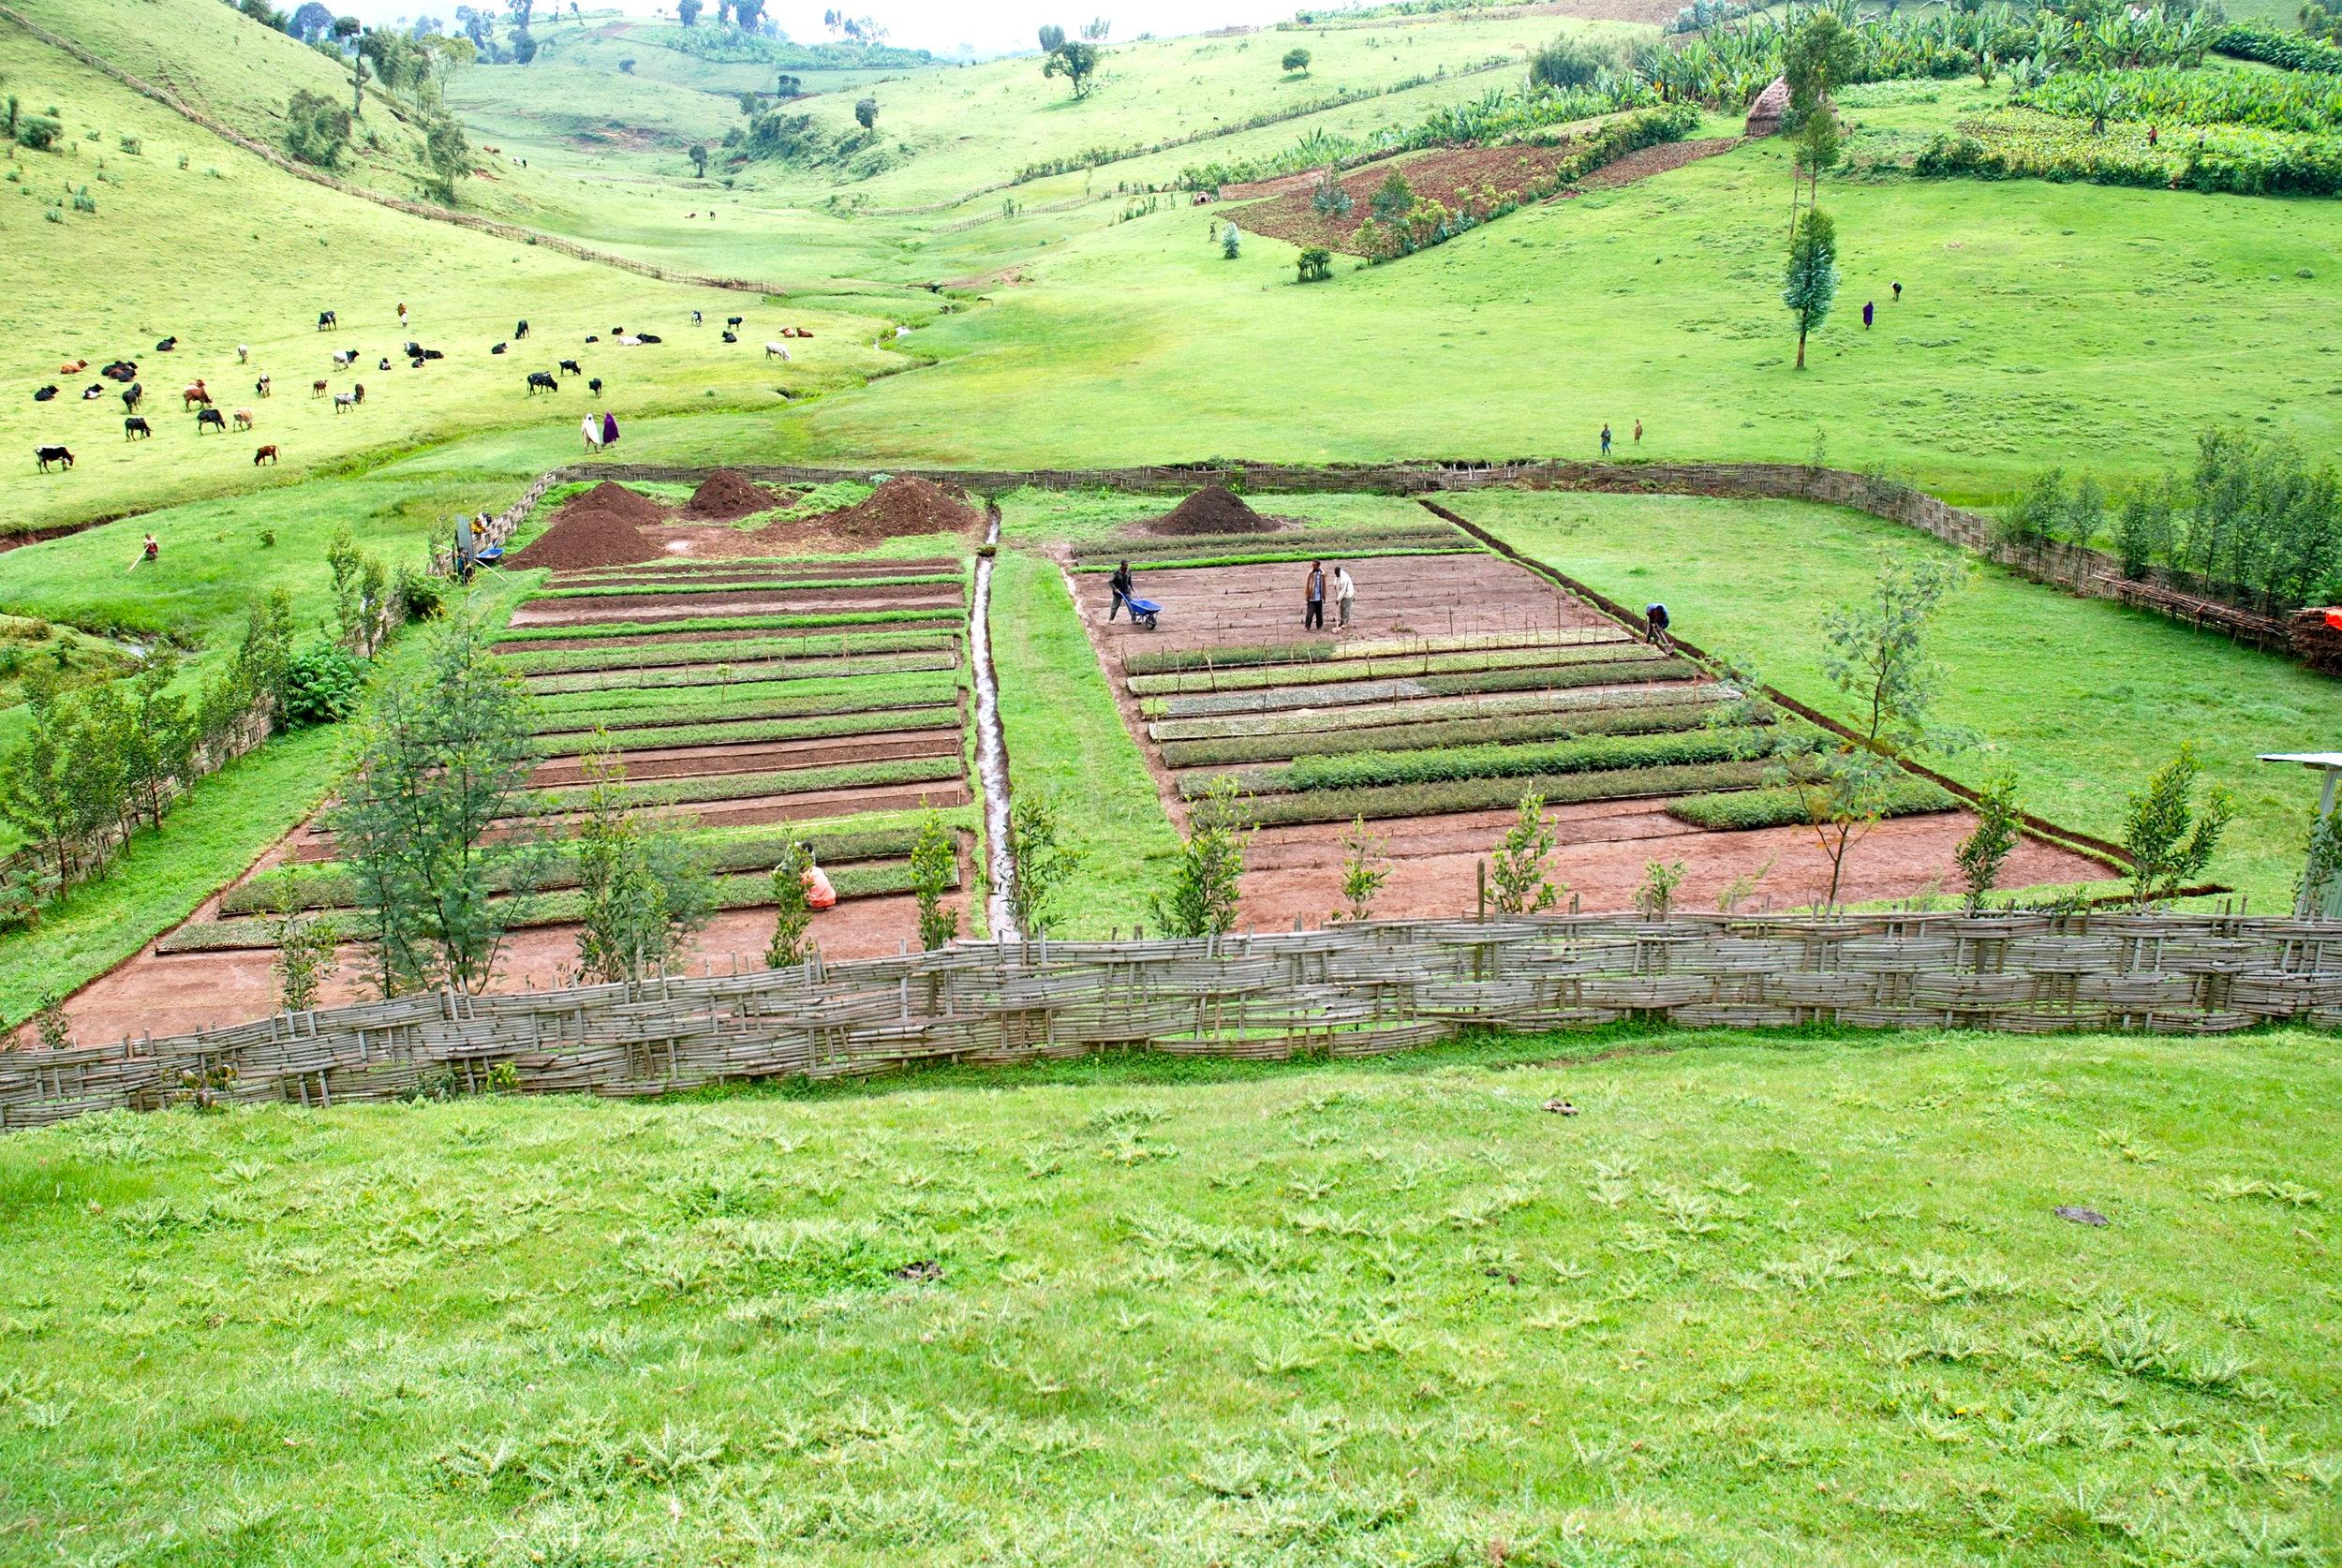 planting-trees-ethiopia_0.jpg